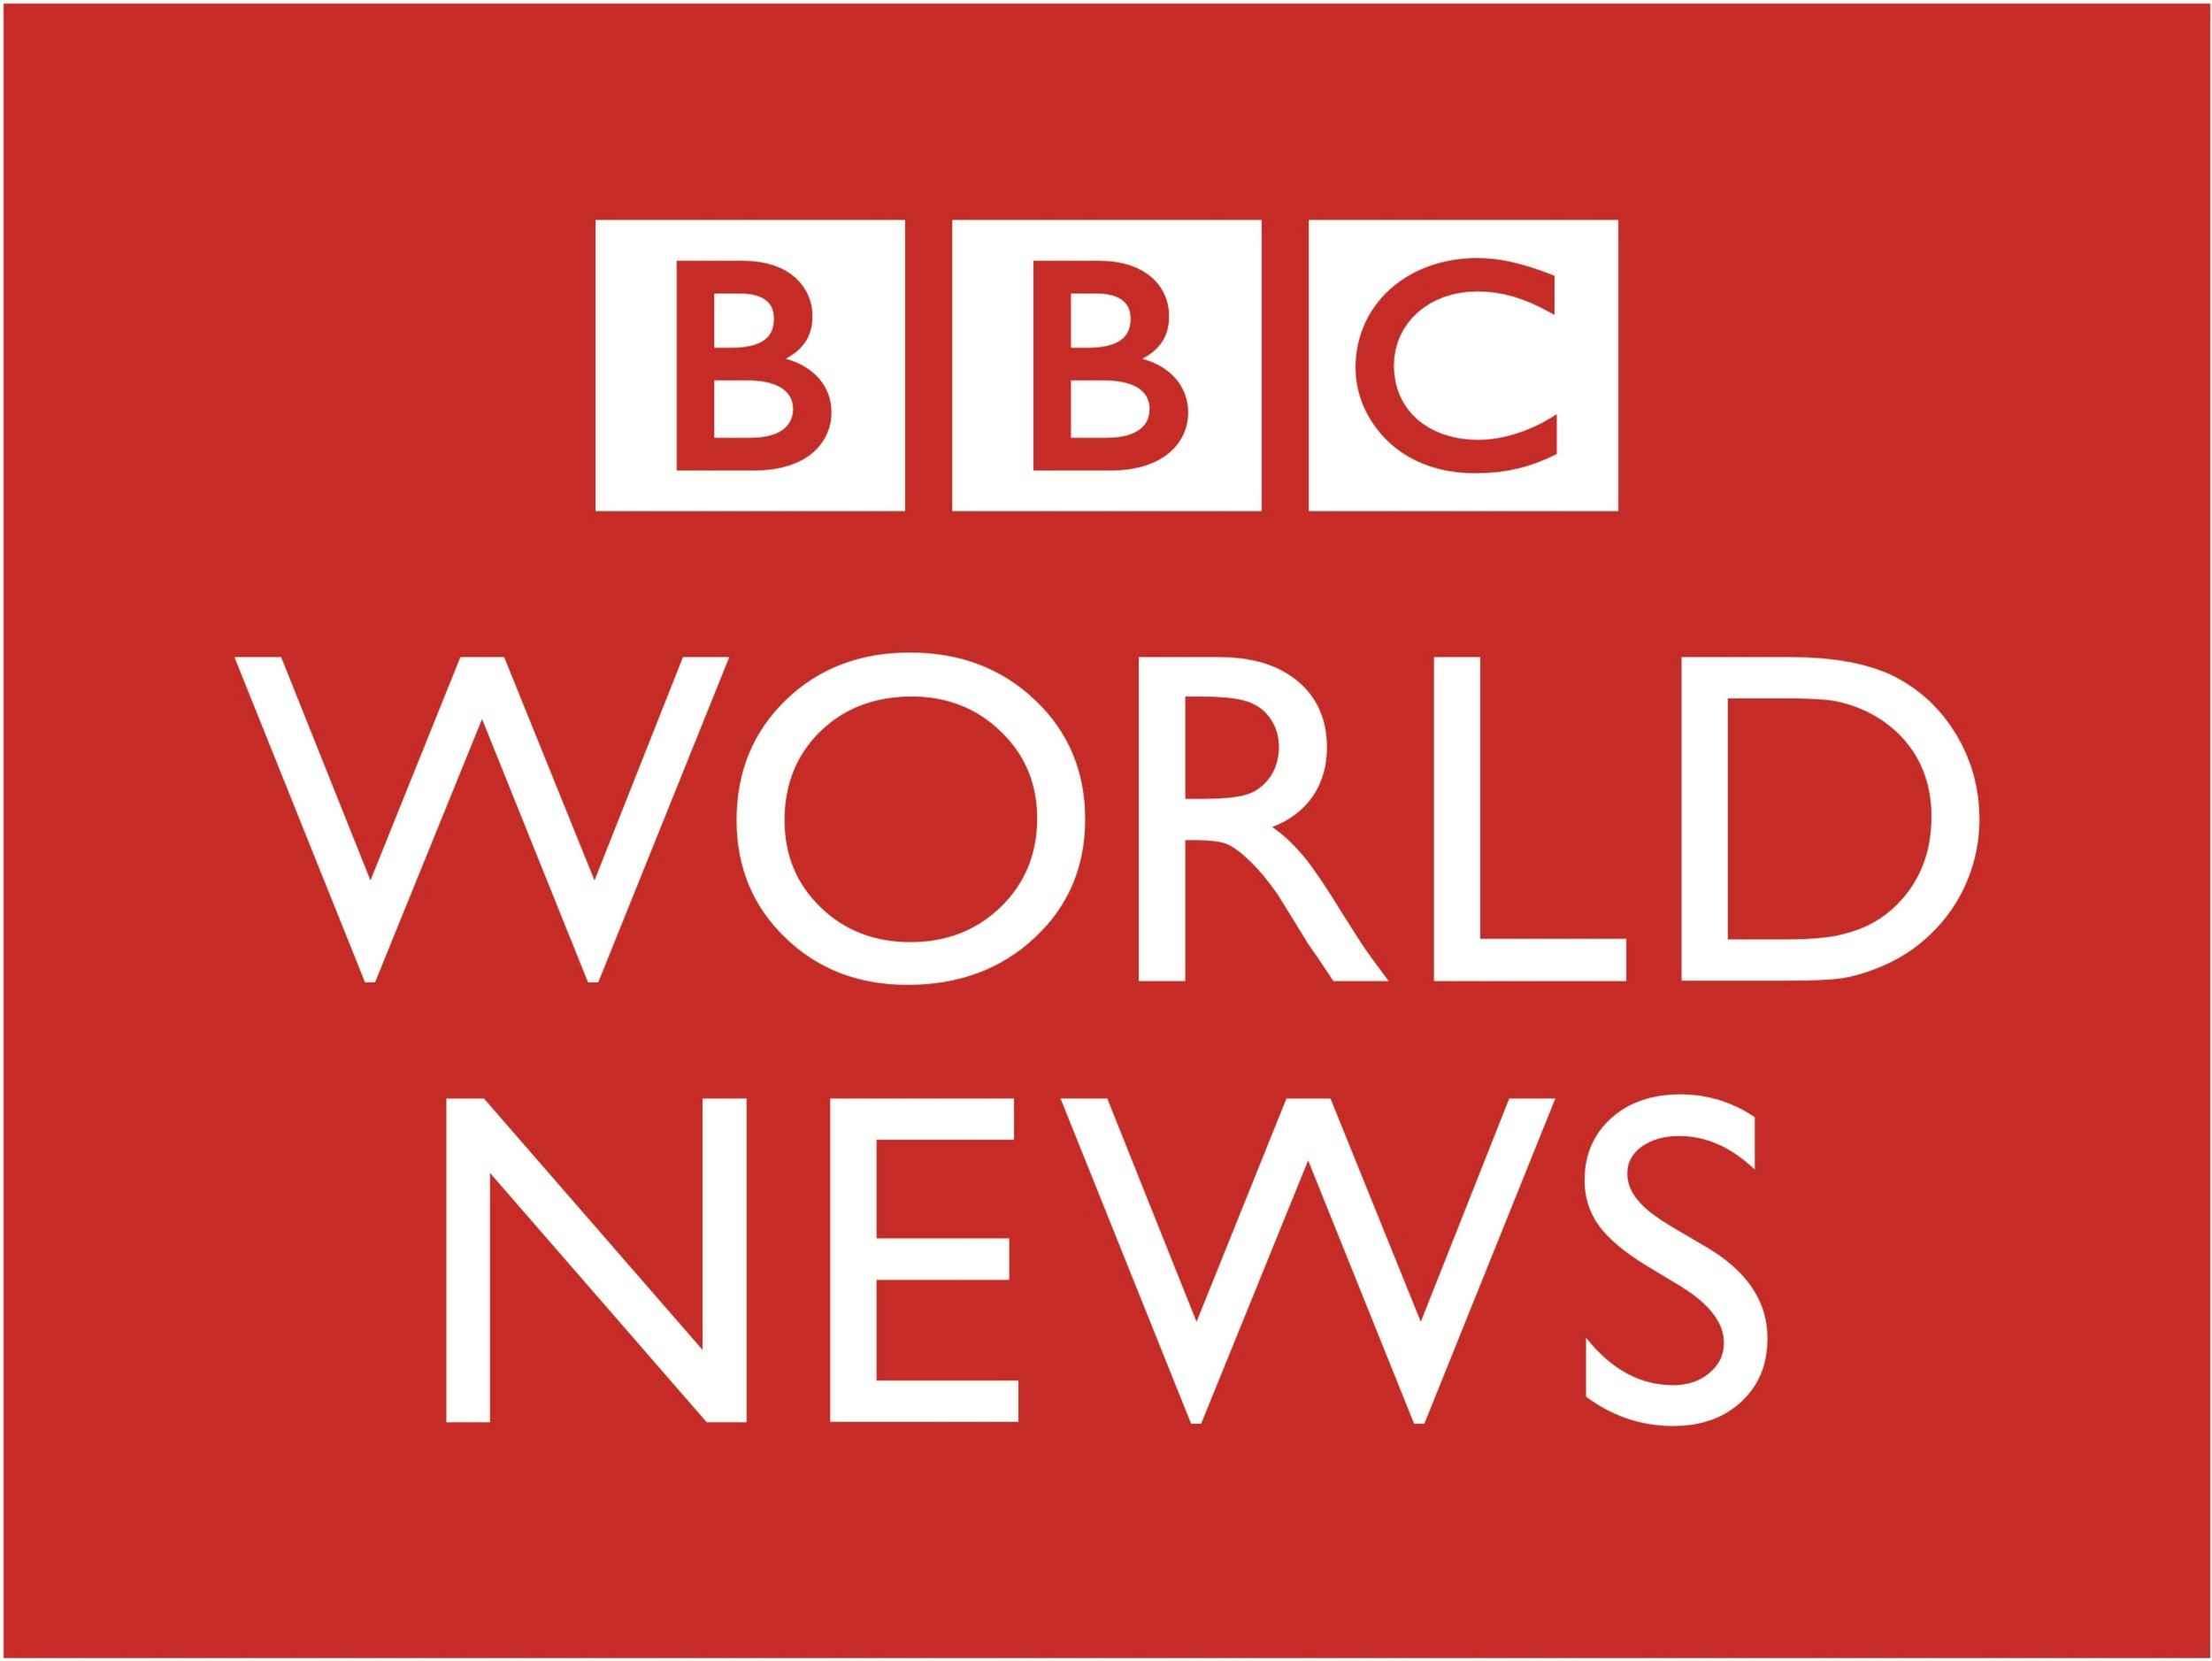 BBC World News Logo Download Vector.